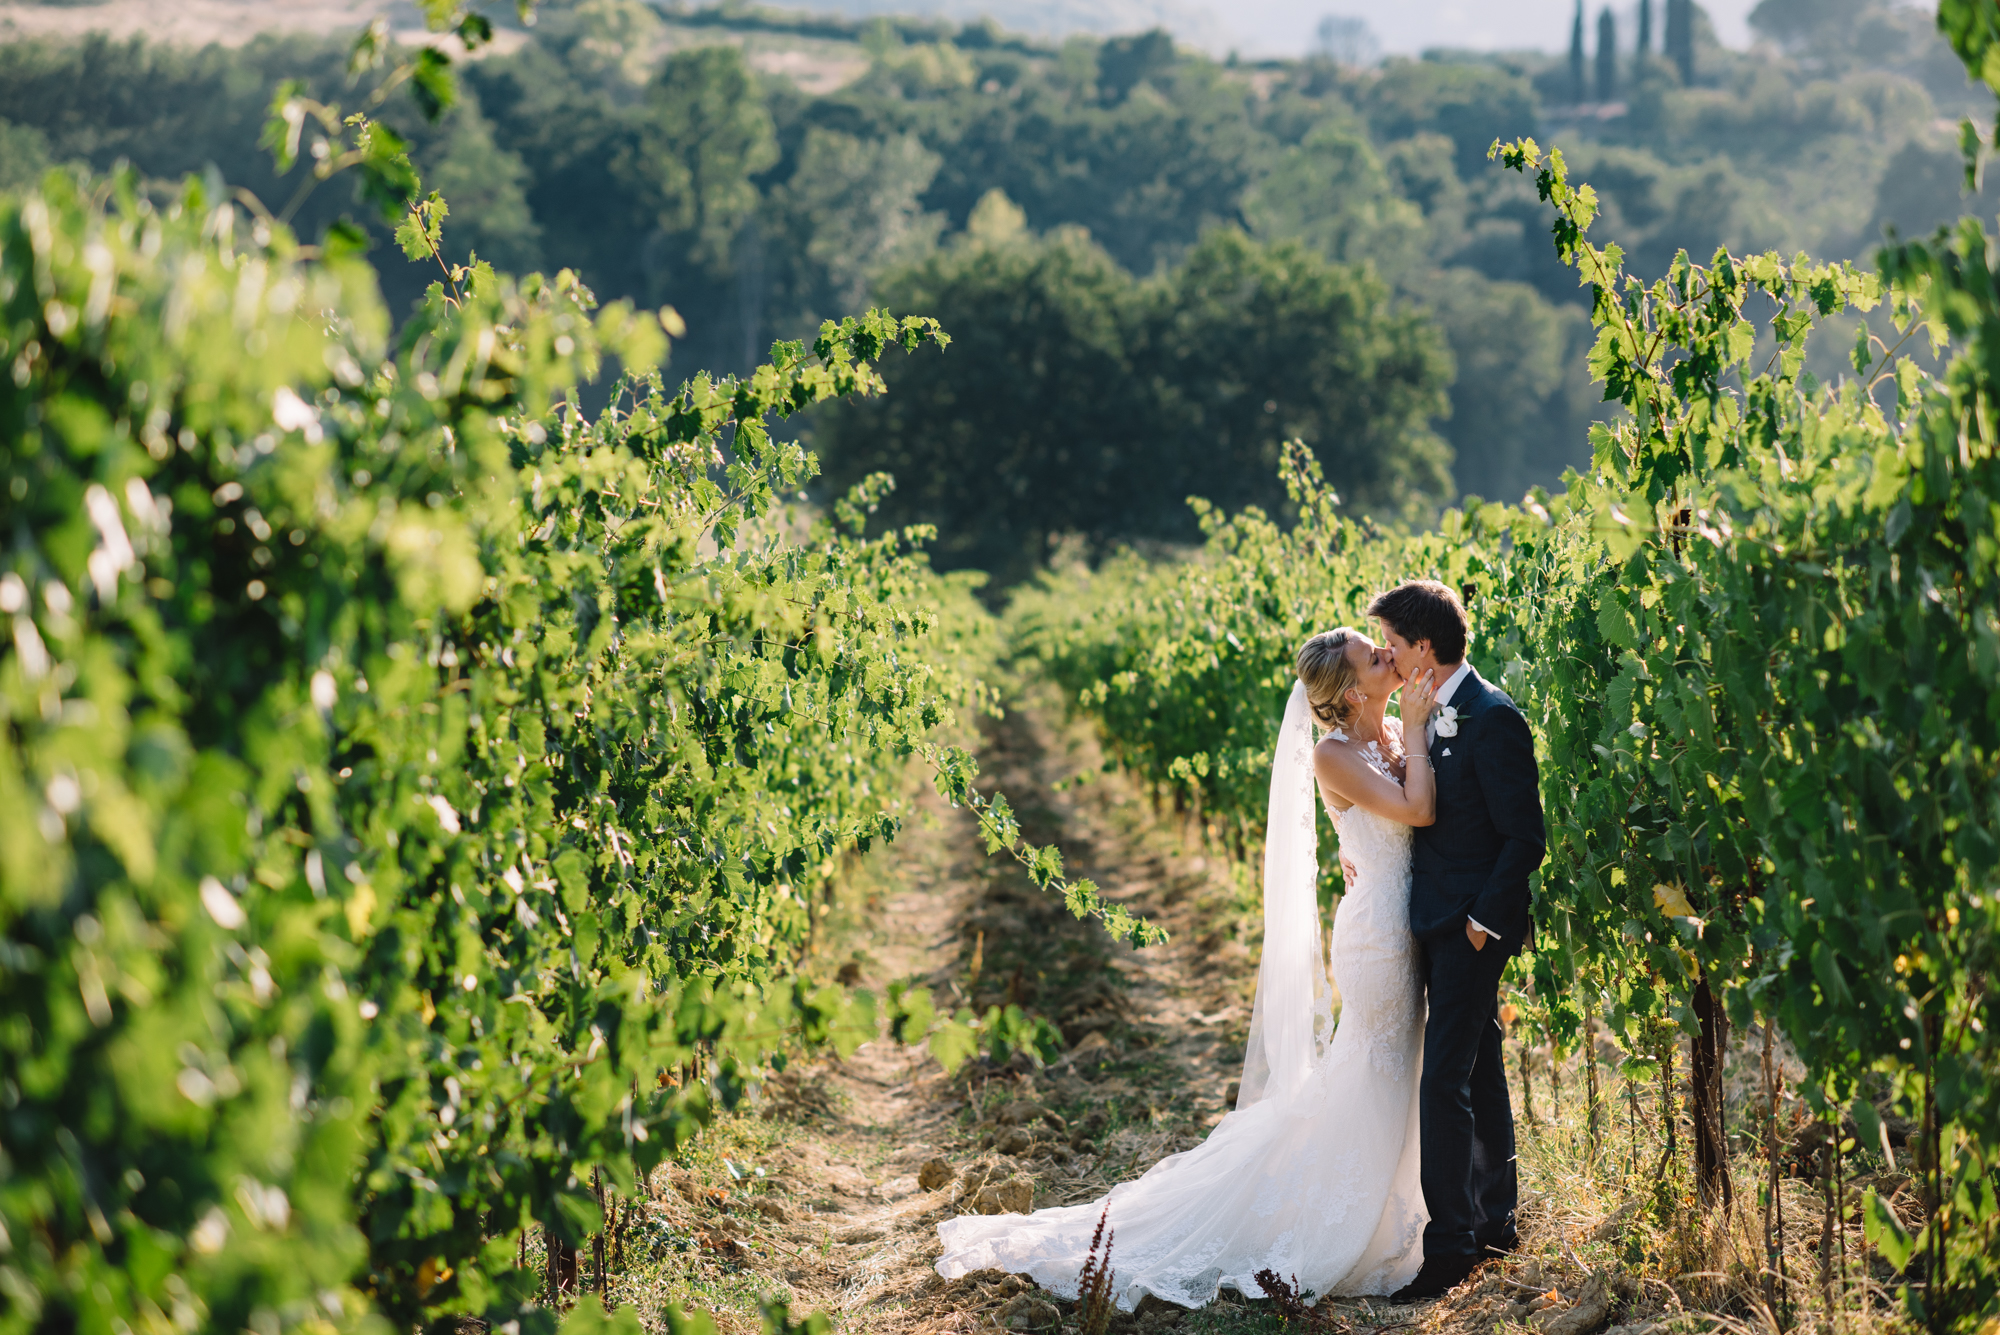 Wedding_Photographer_in_Tuscany_Italy-018.jpg